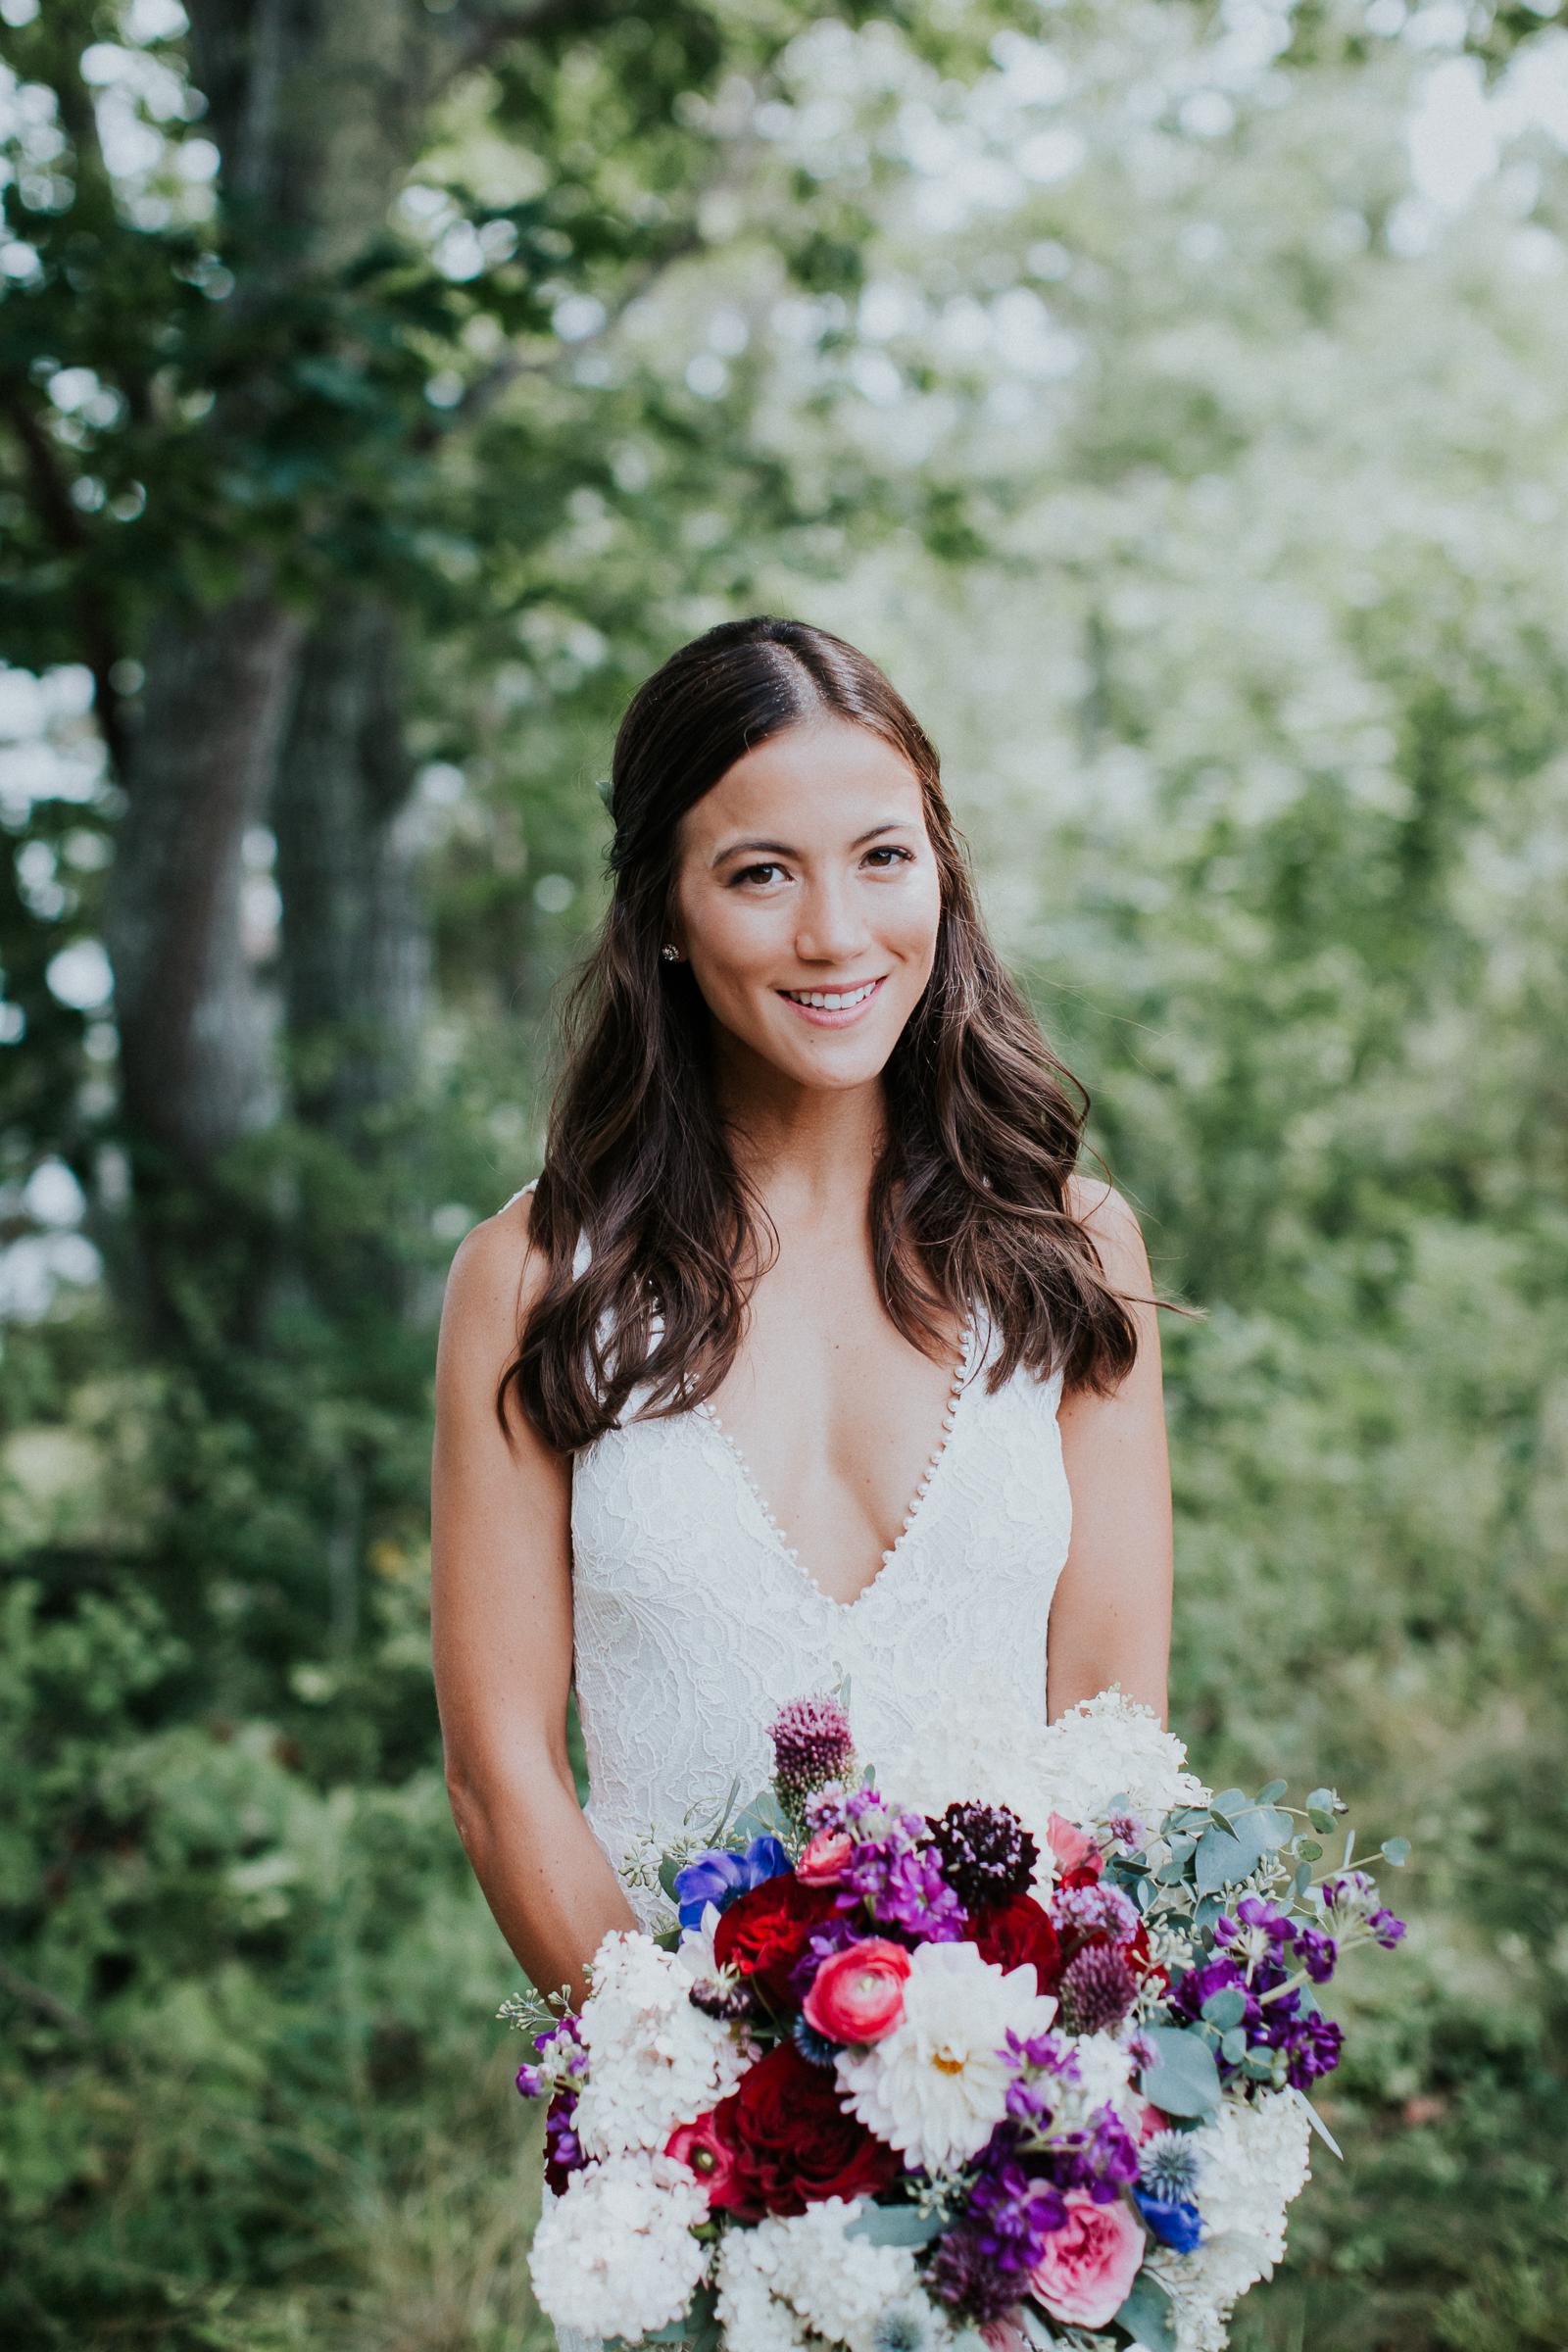 Marianmade-Farm-Wiscasset-Maine-Fine-Art-Documentary-Wedding-Photographer-Elvira-Kalviste-Photography-49.jpg